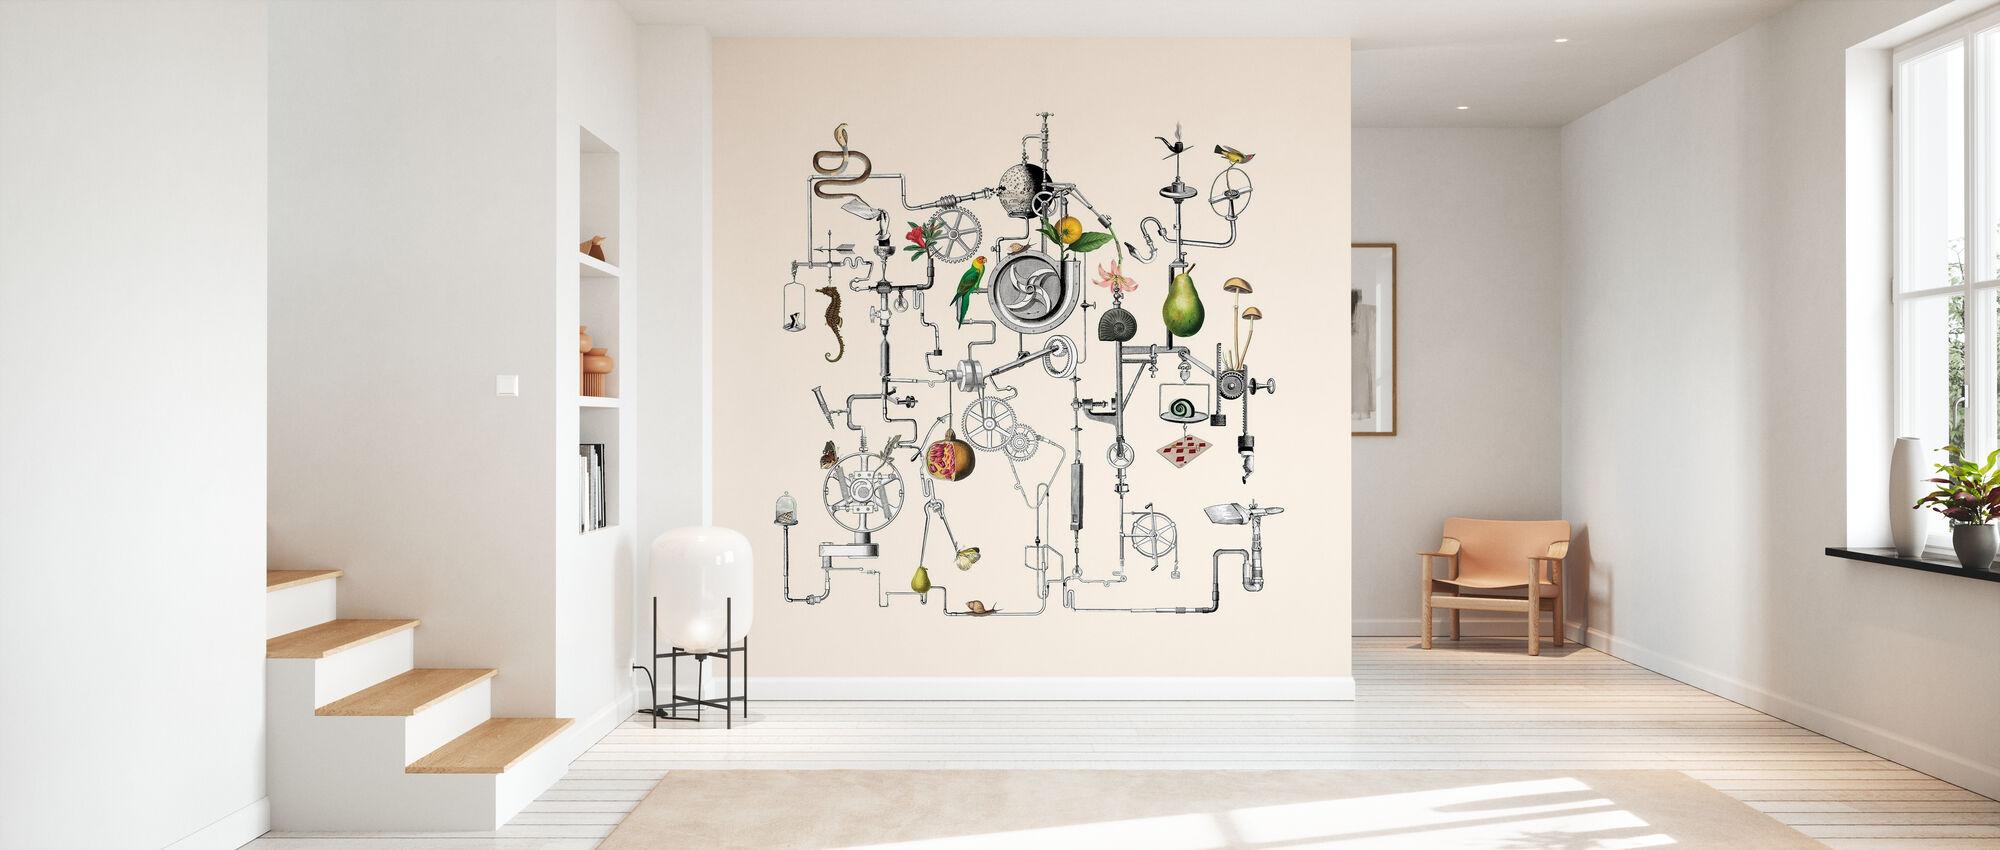 Ghost in the Machine - Peach - Wallpaper - Hallway